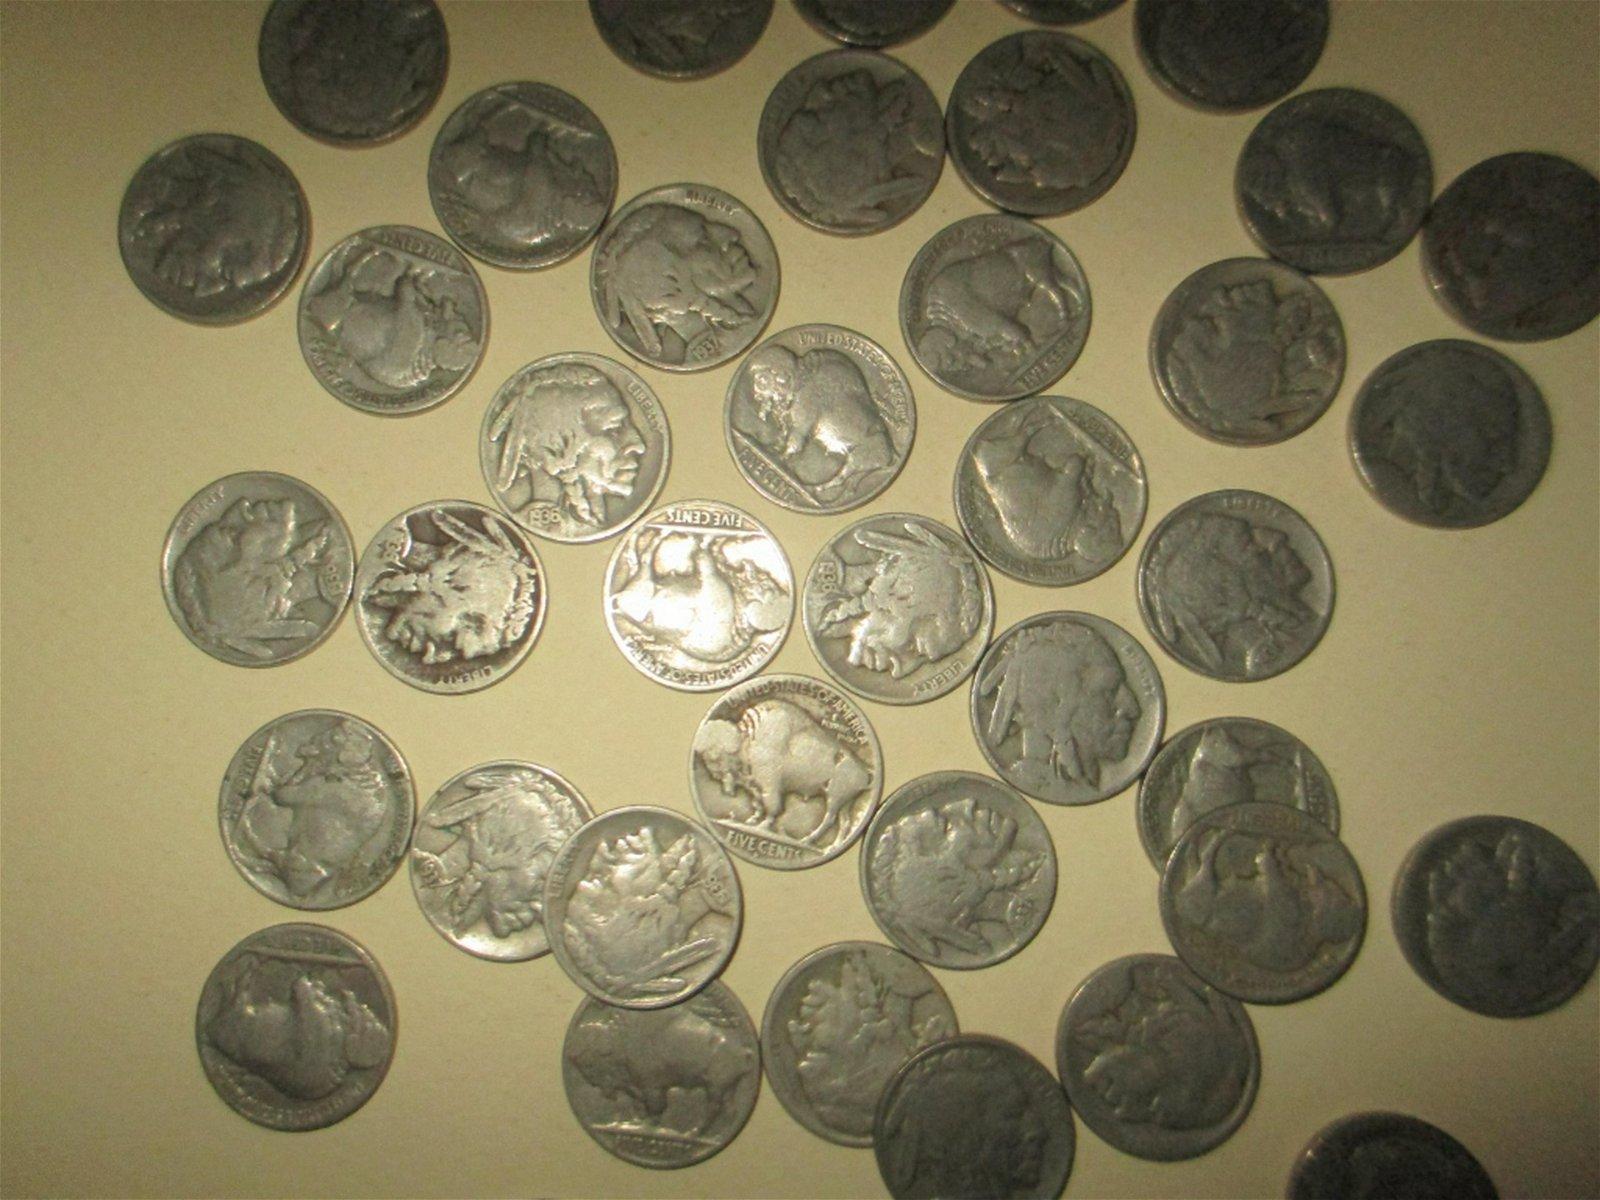 Lot of 46 Indian Head Nickels